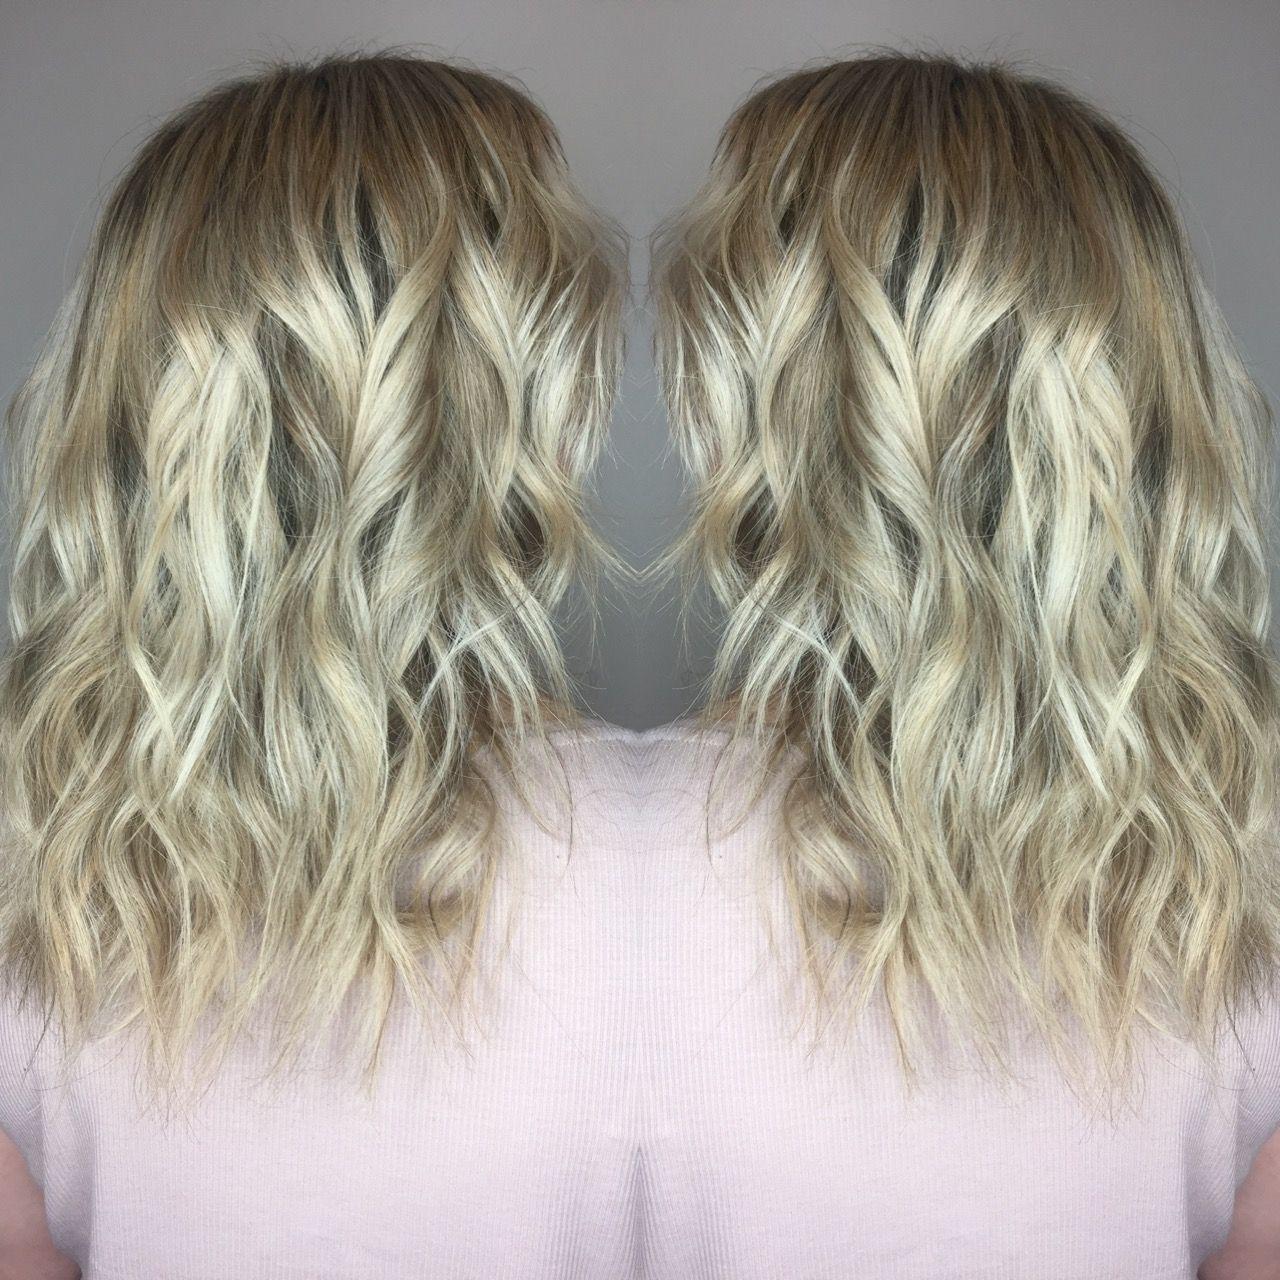 Bespoke Hair Color By Kerrytape In Hair Extensions Wexford